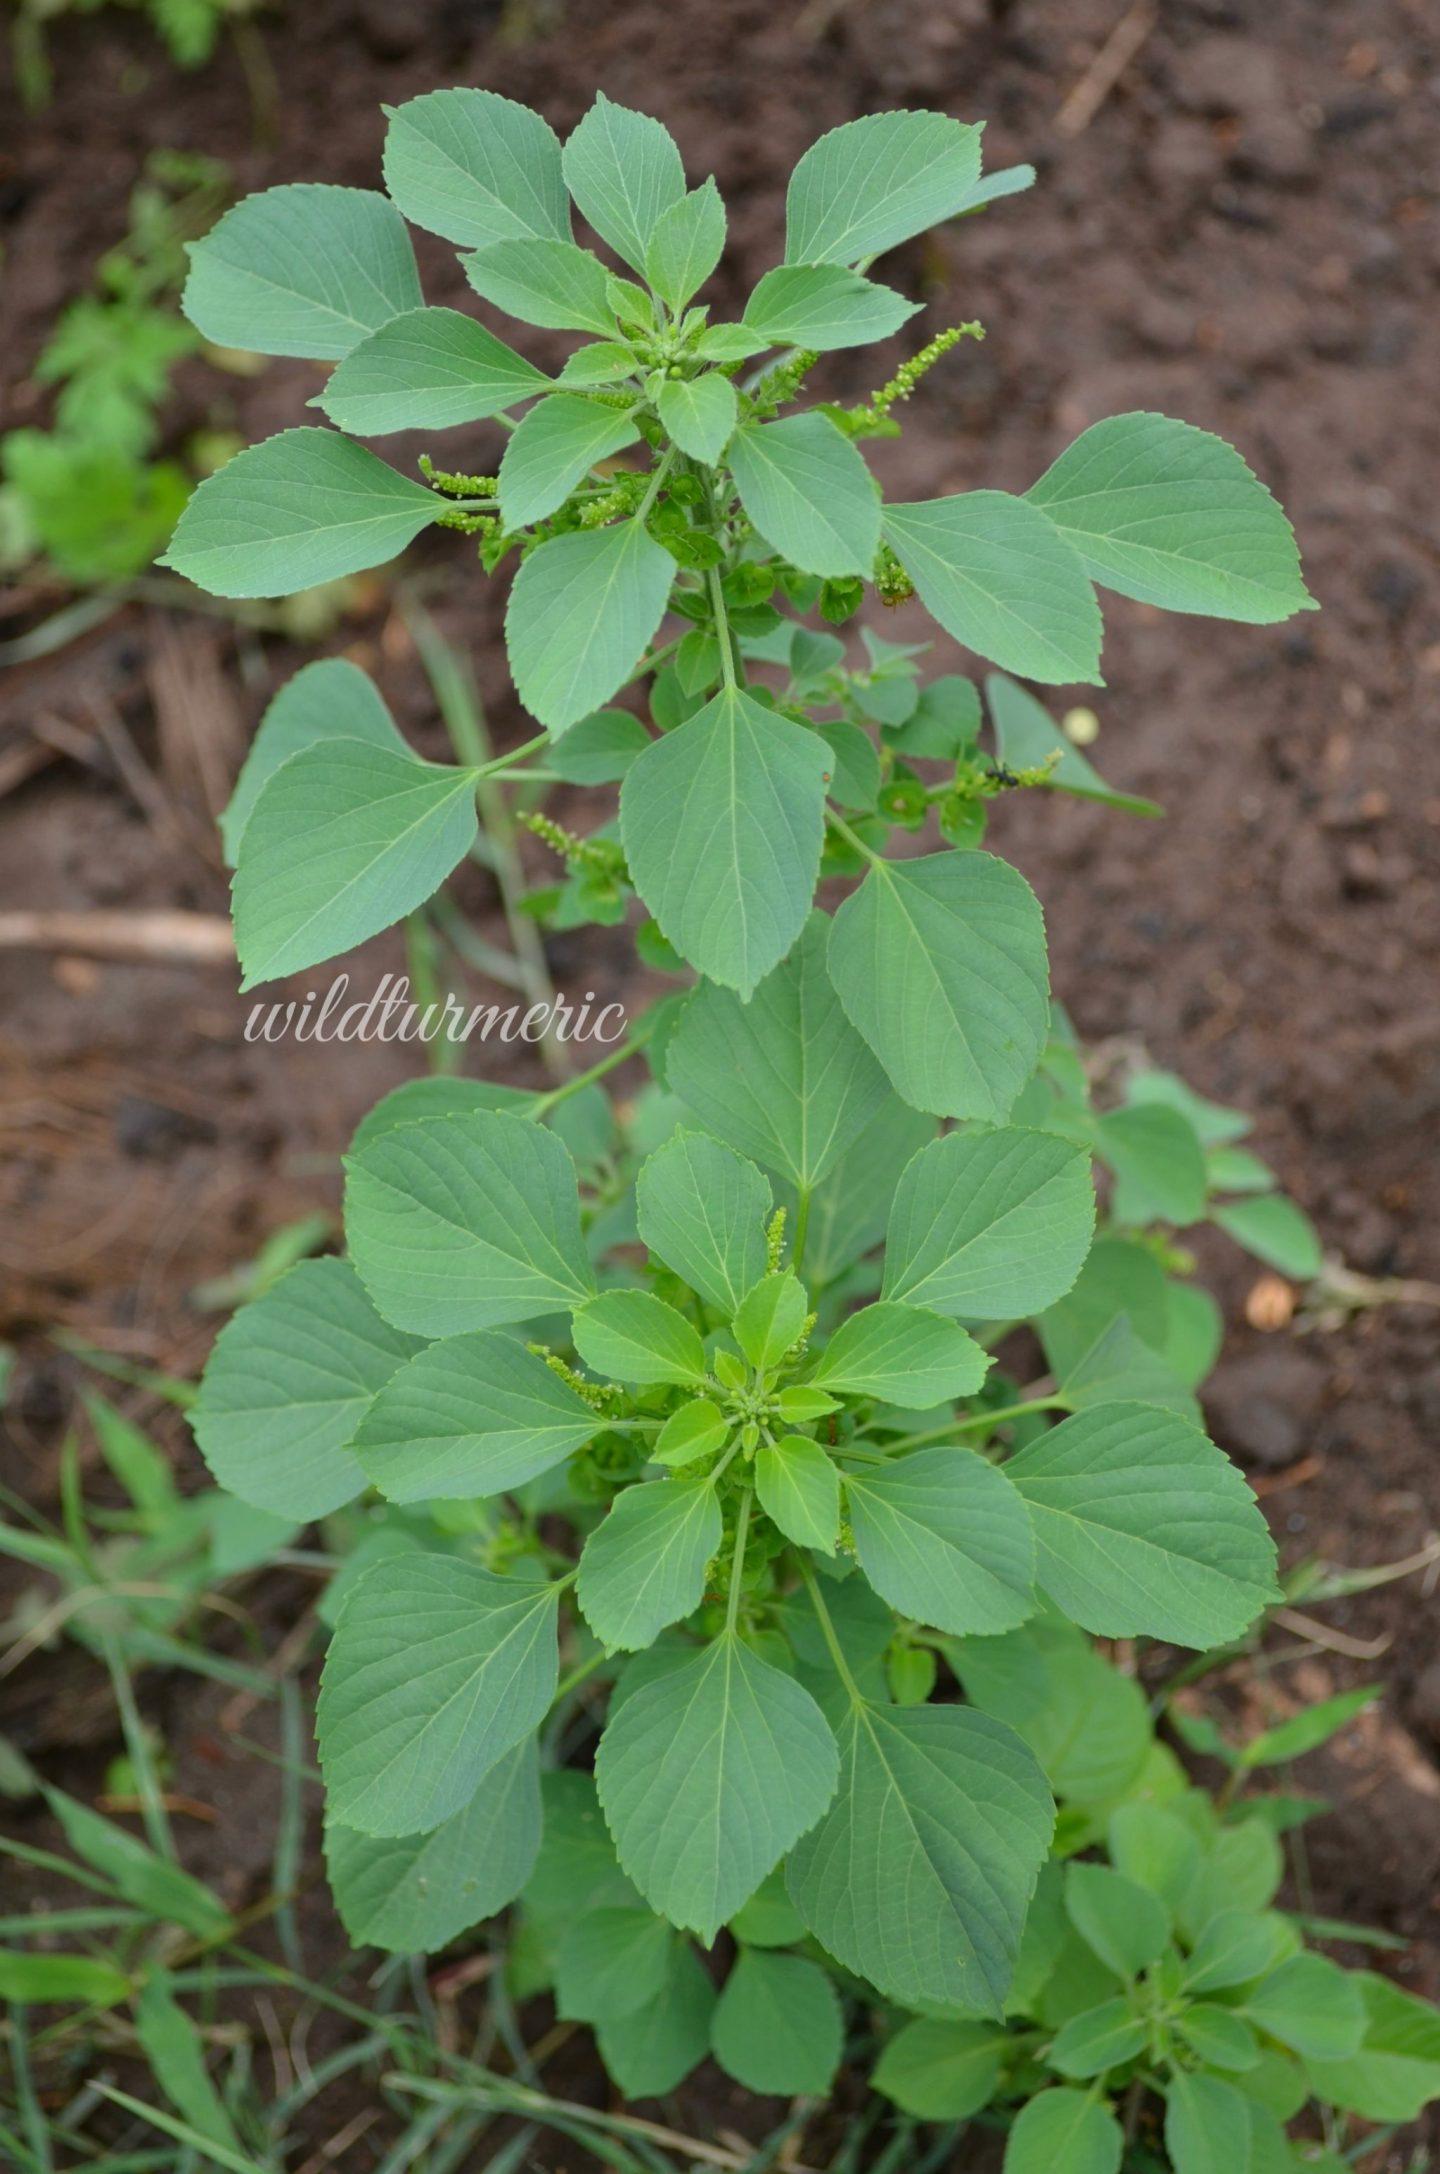 acalypha indica medicinal uses